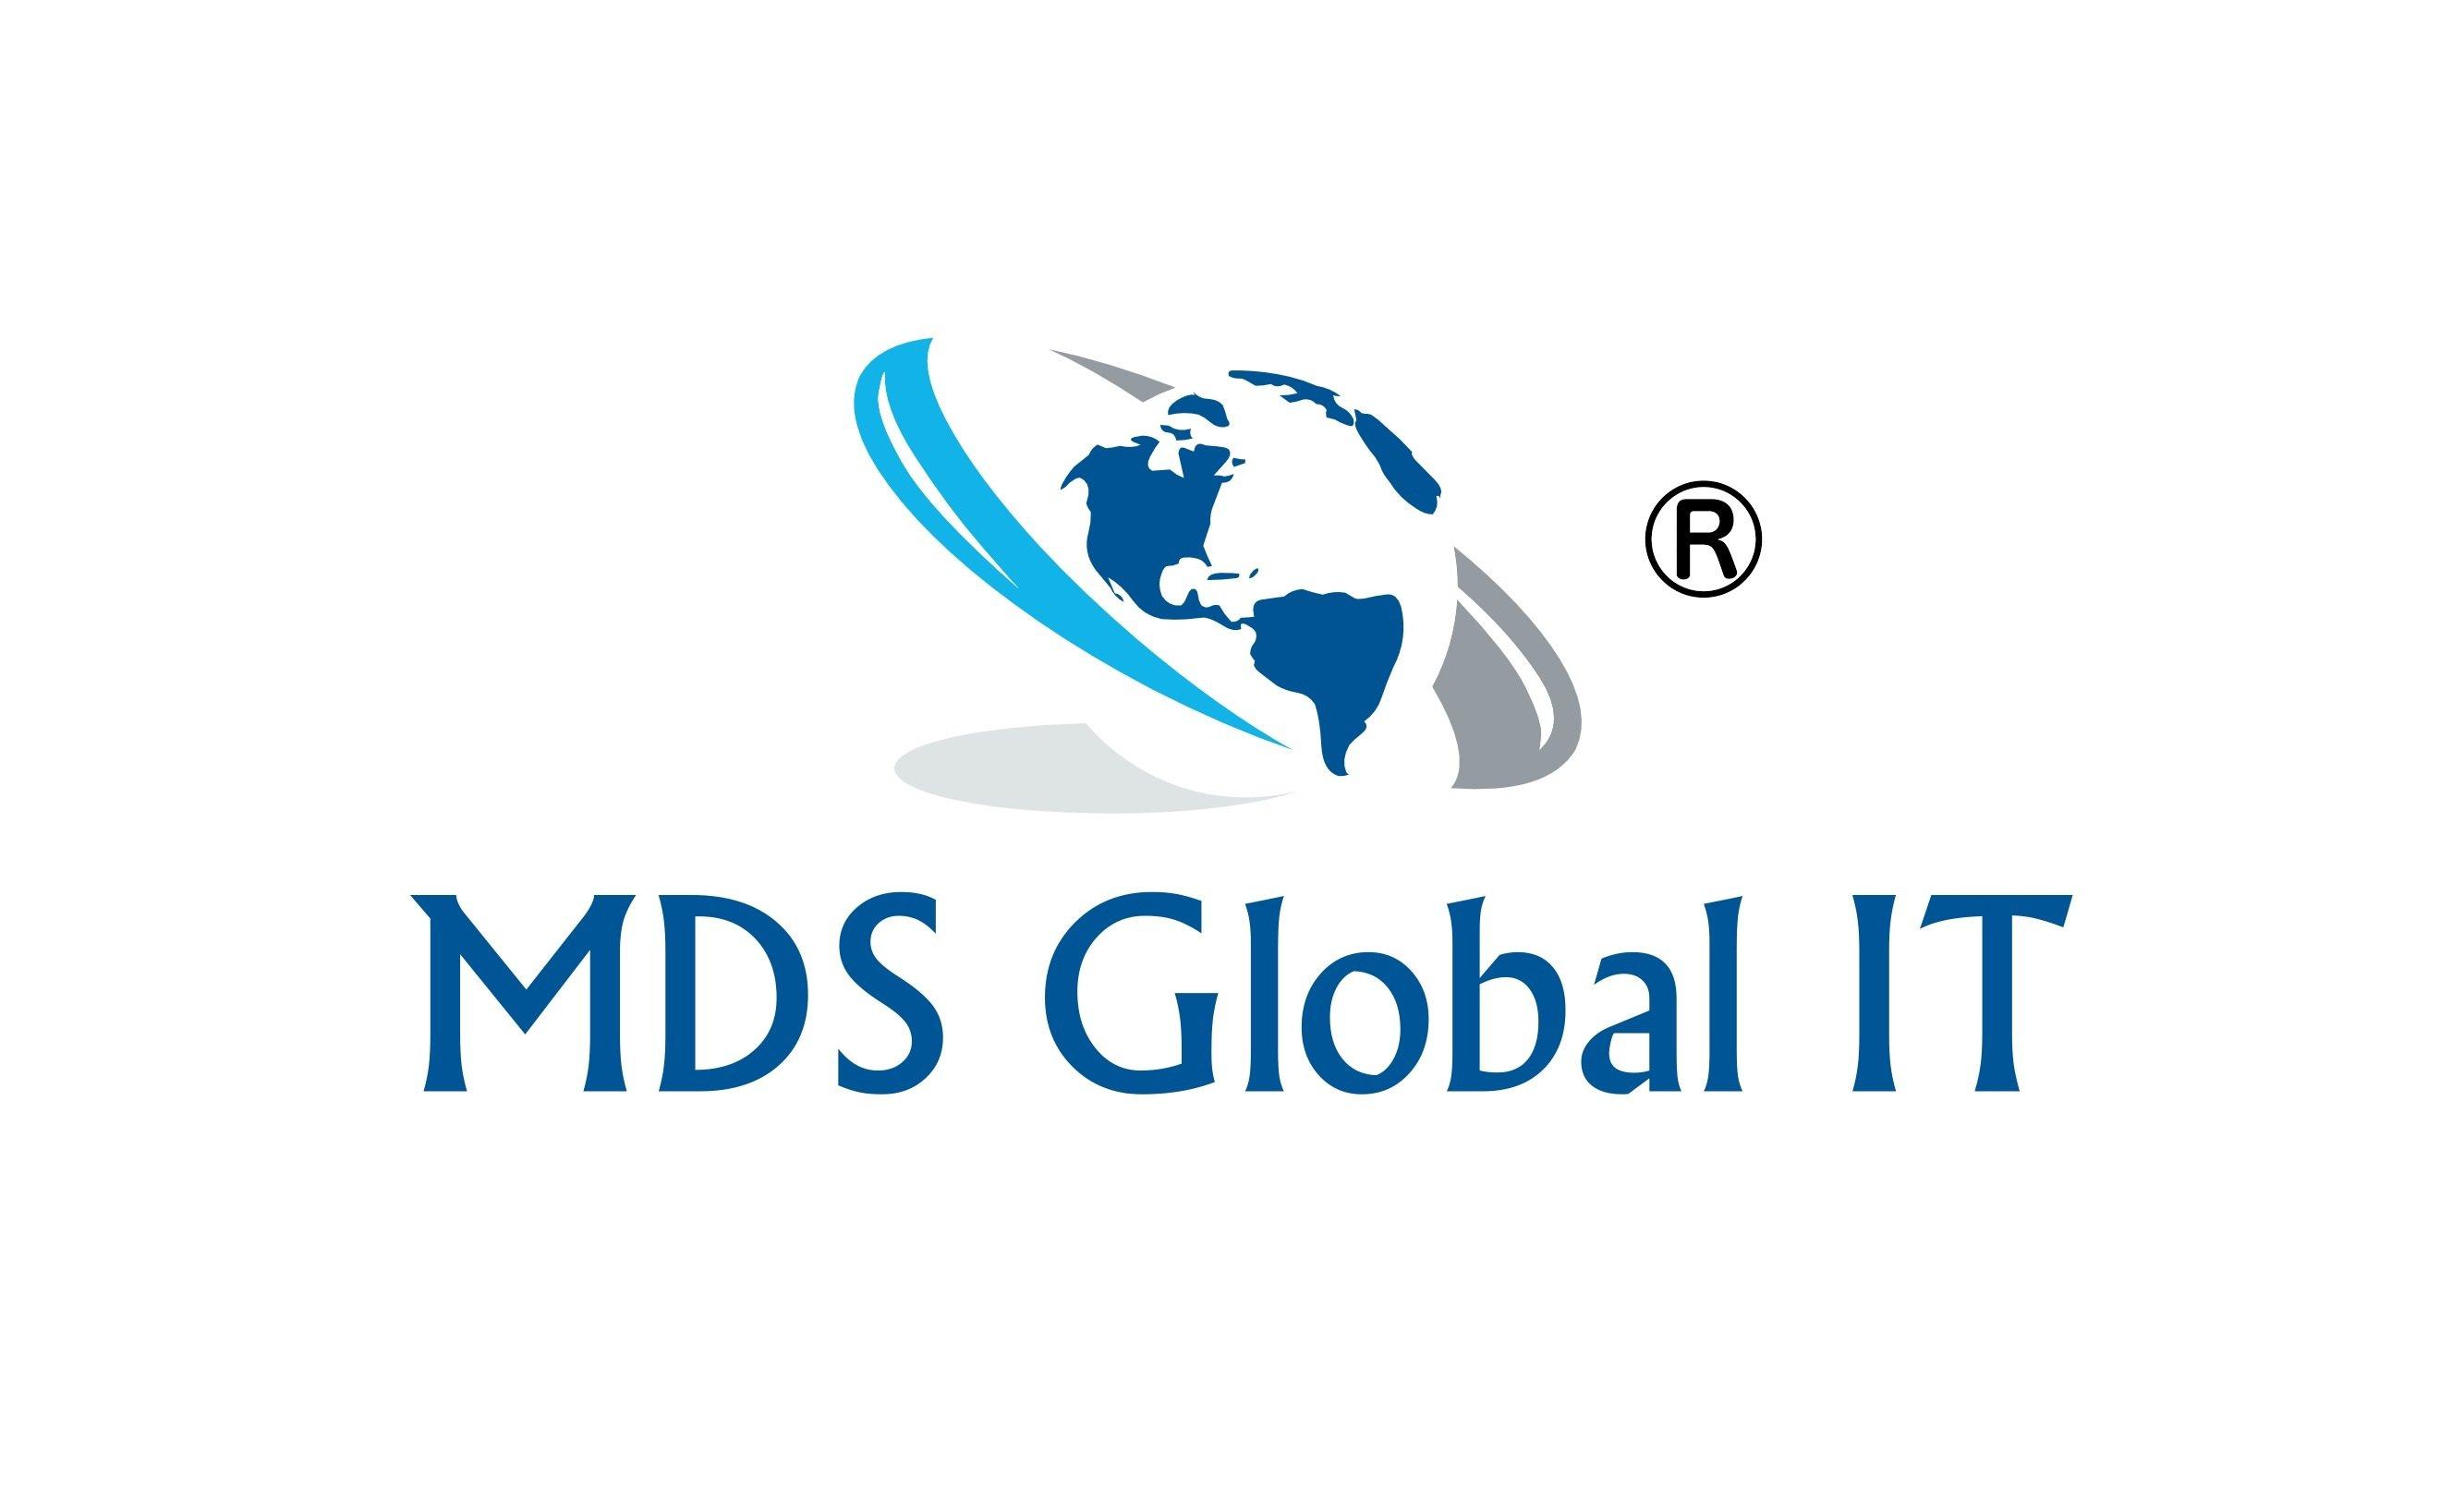 MDS Global IT